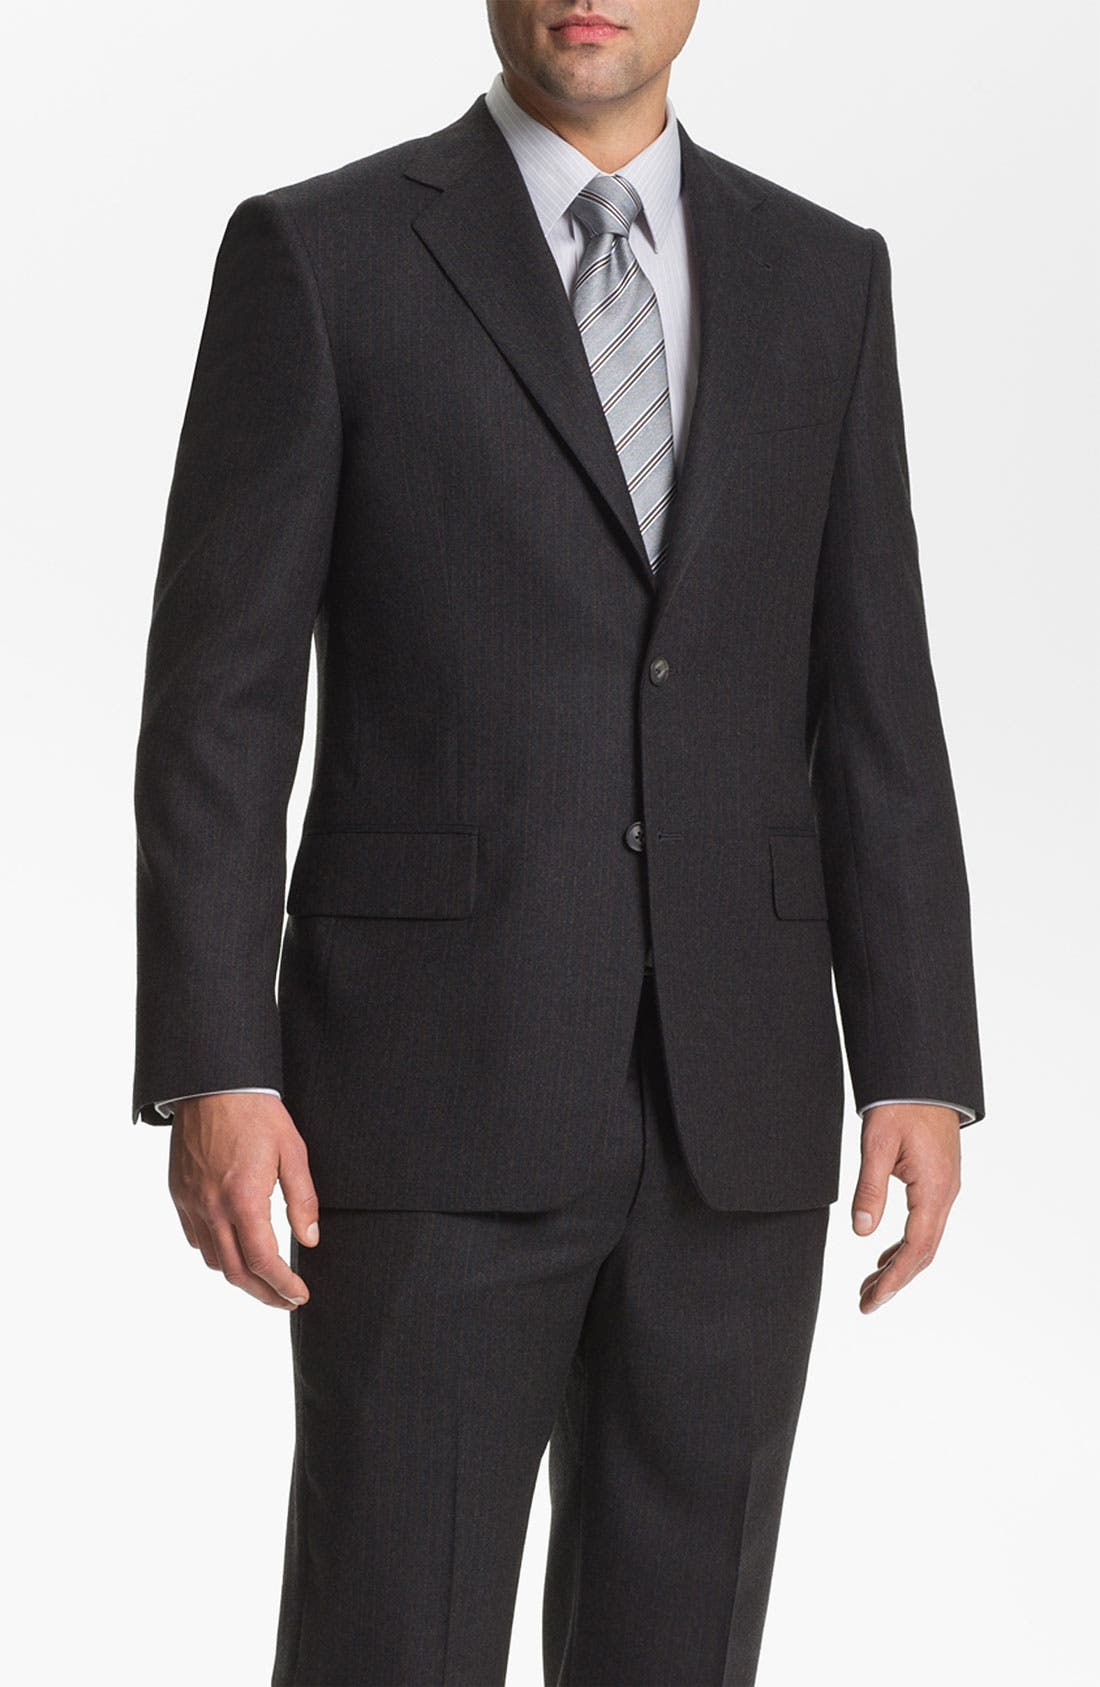 Alternate Image 1 Selected - Joseph Abboud 'Signature Silver' Stripe Suit